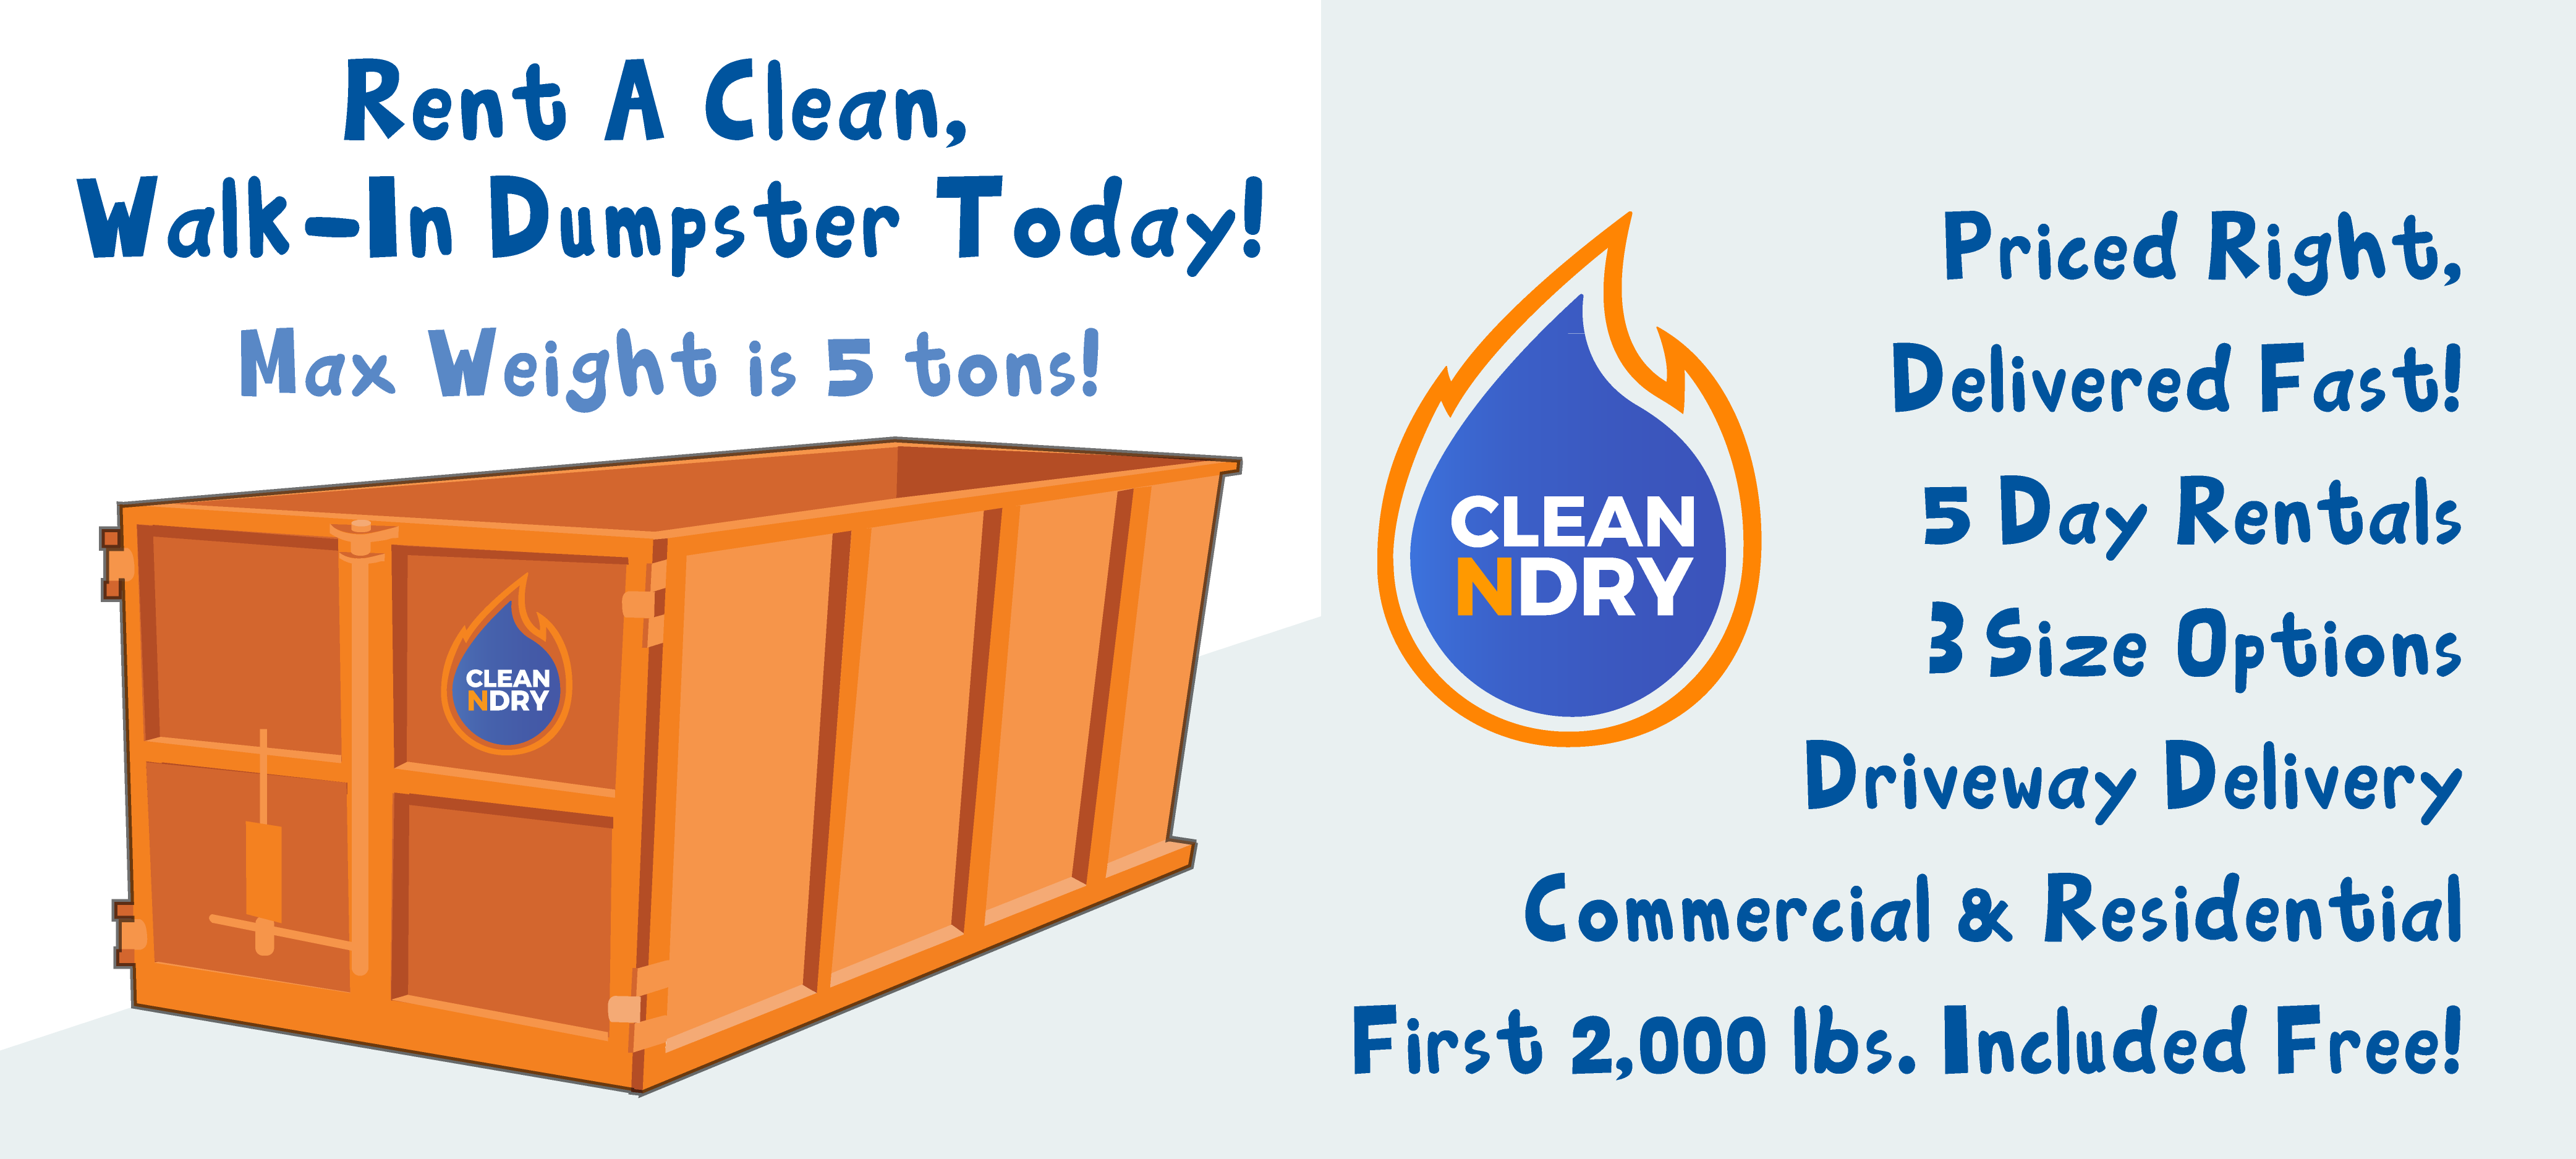 rent a dumpster roll off walk in dumpster rental orlando dumpster delivery-01